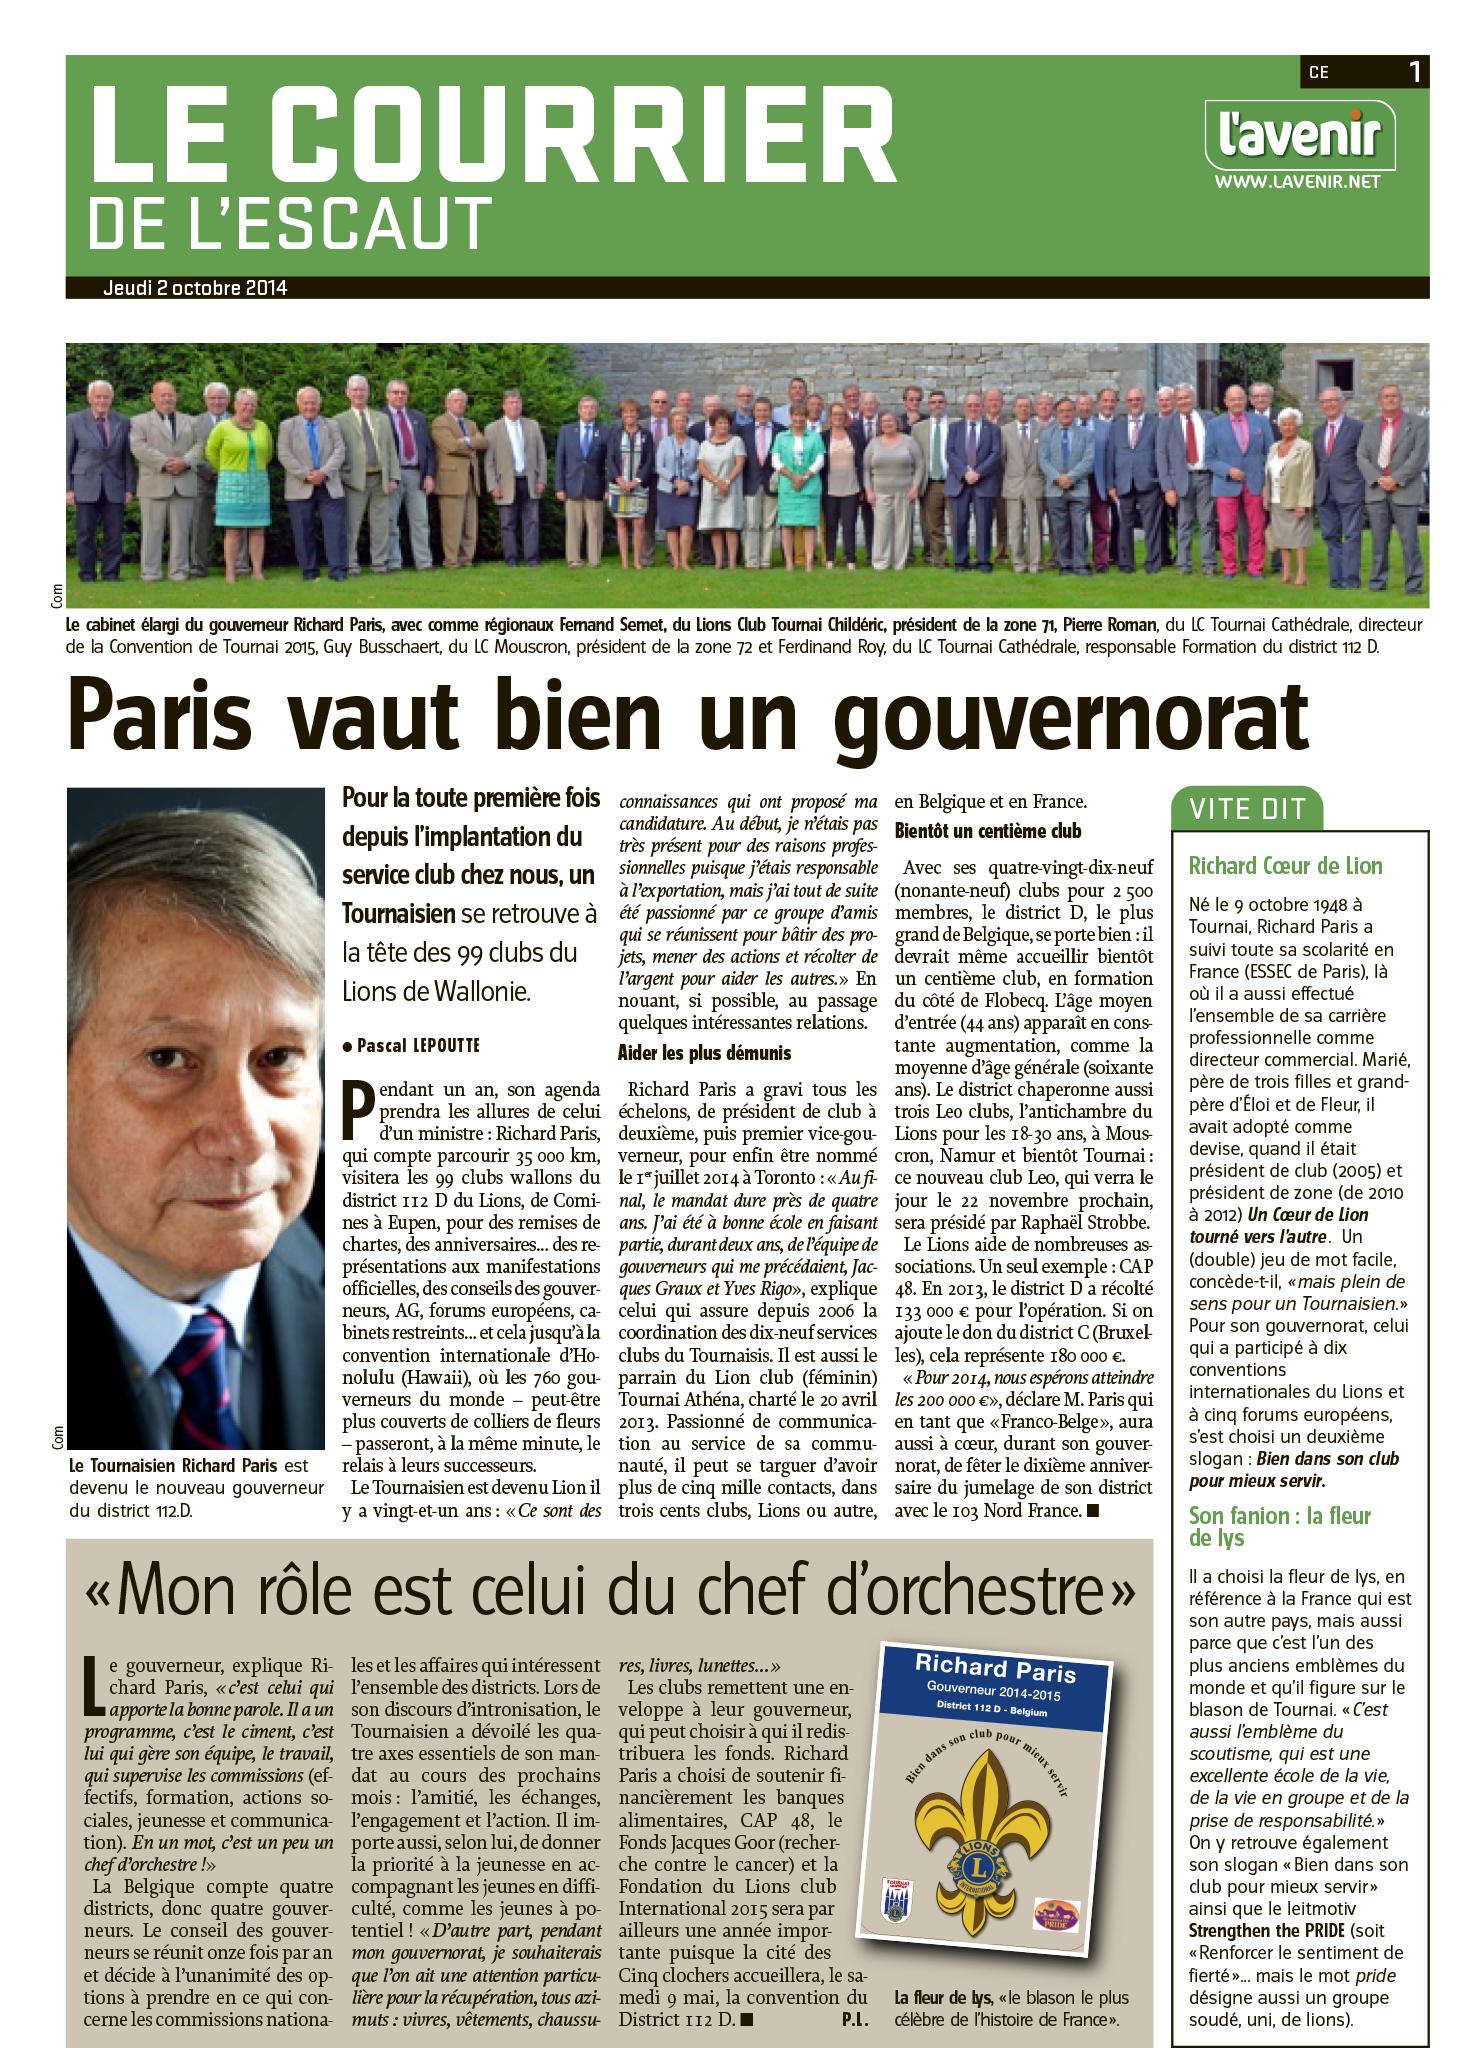 20121002 Courrier gouvernorat